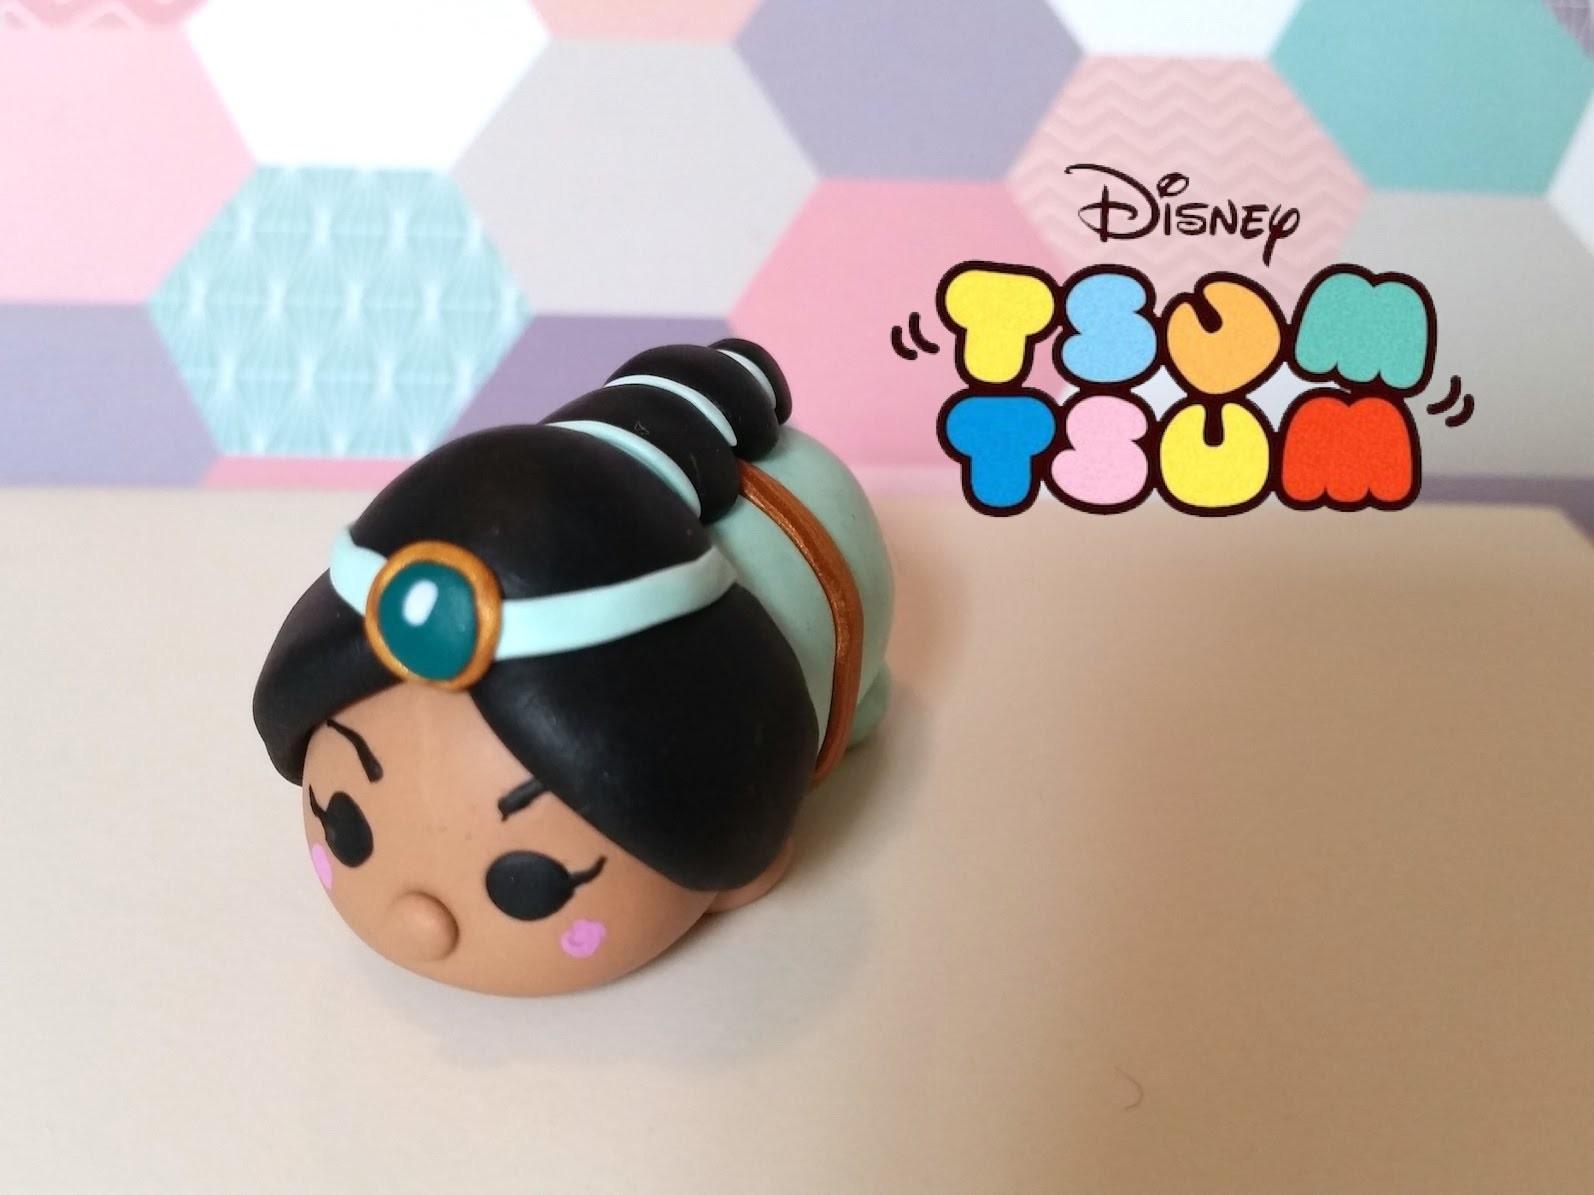 Diy Tsum Tsum Princess Jasmine From Aladdin Polymer Clay